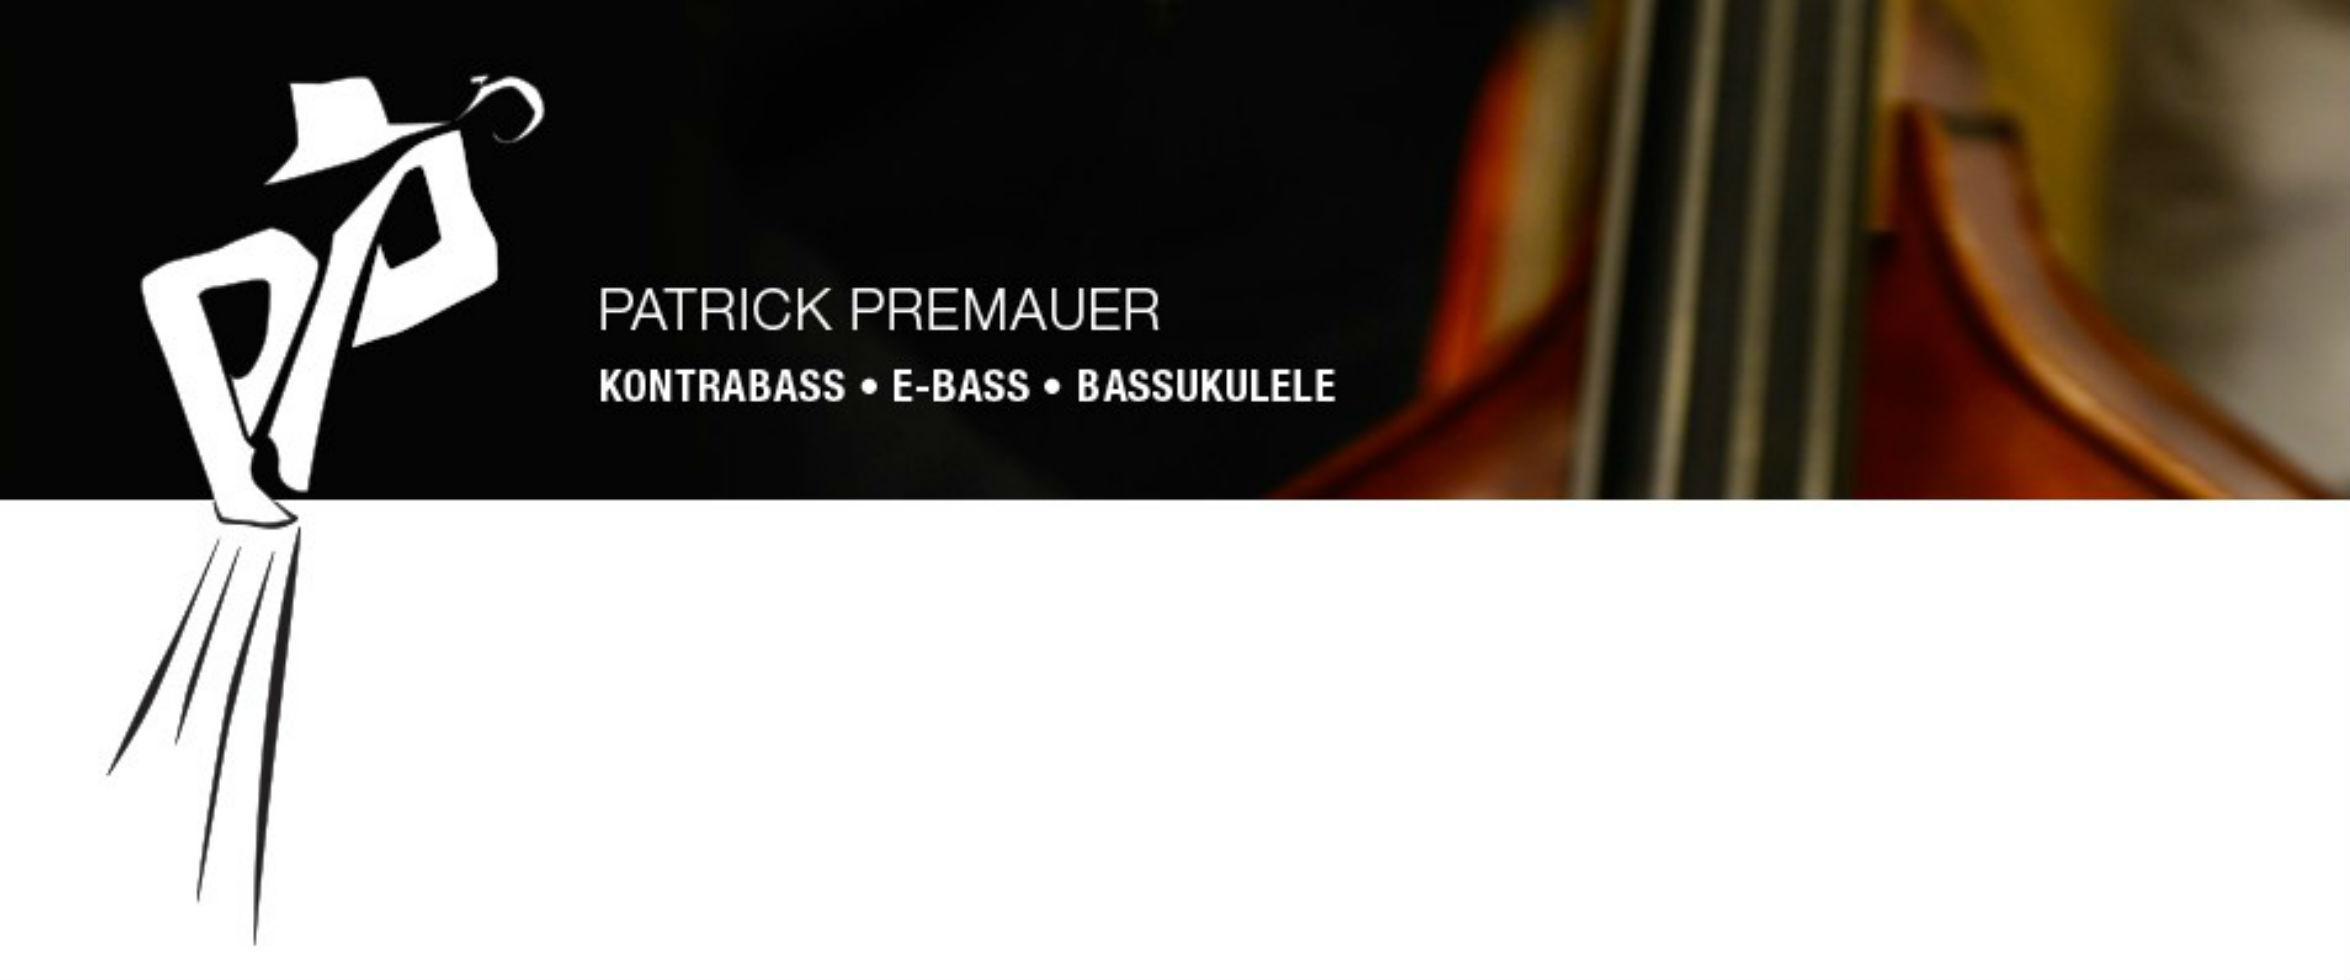 PATRICK PREMAUER